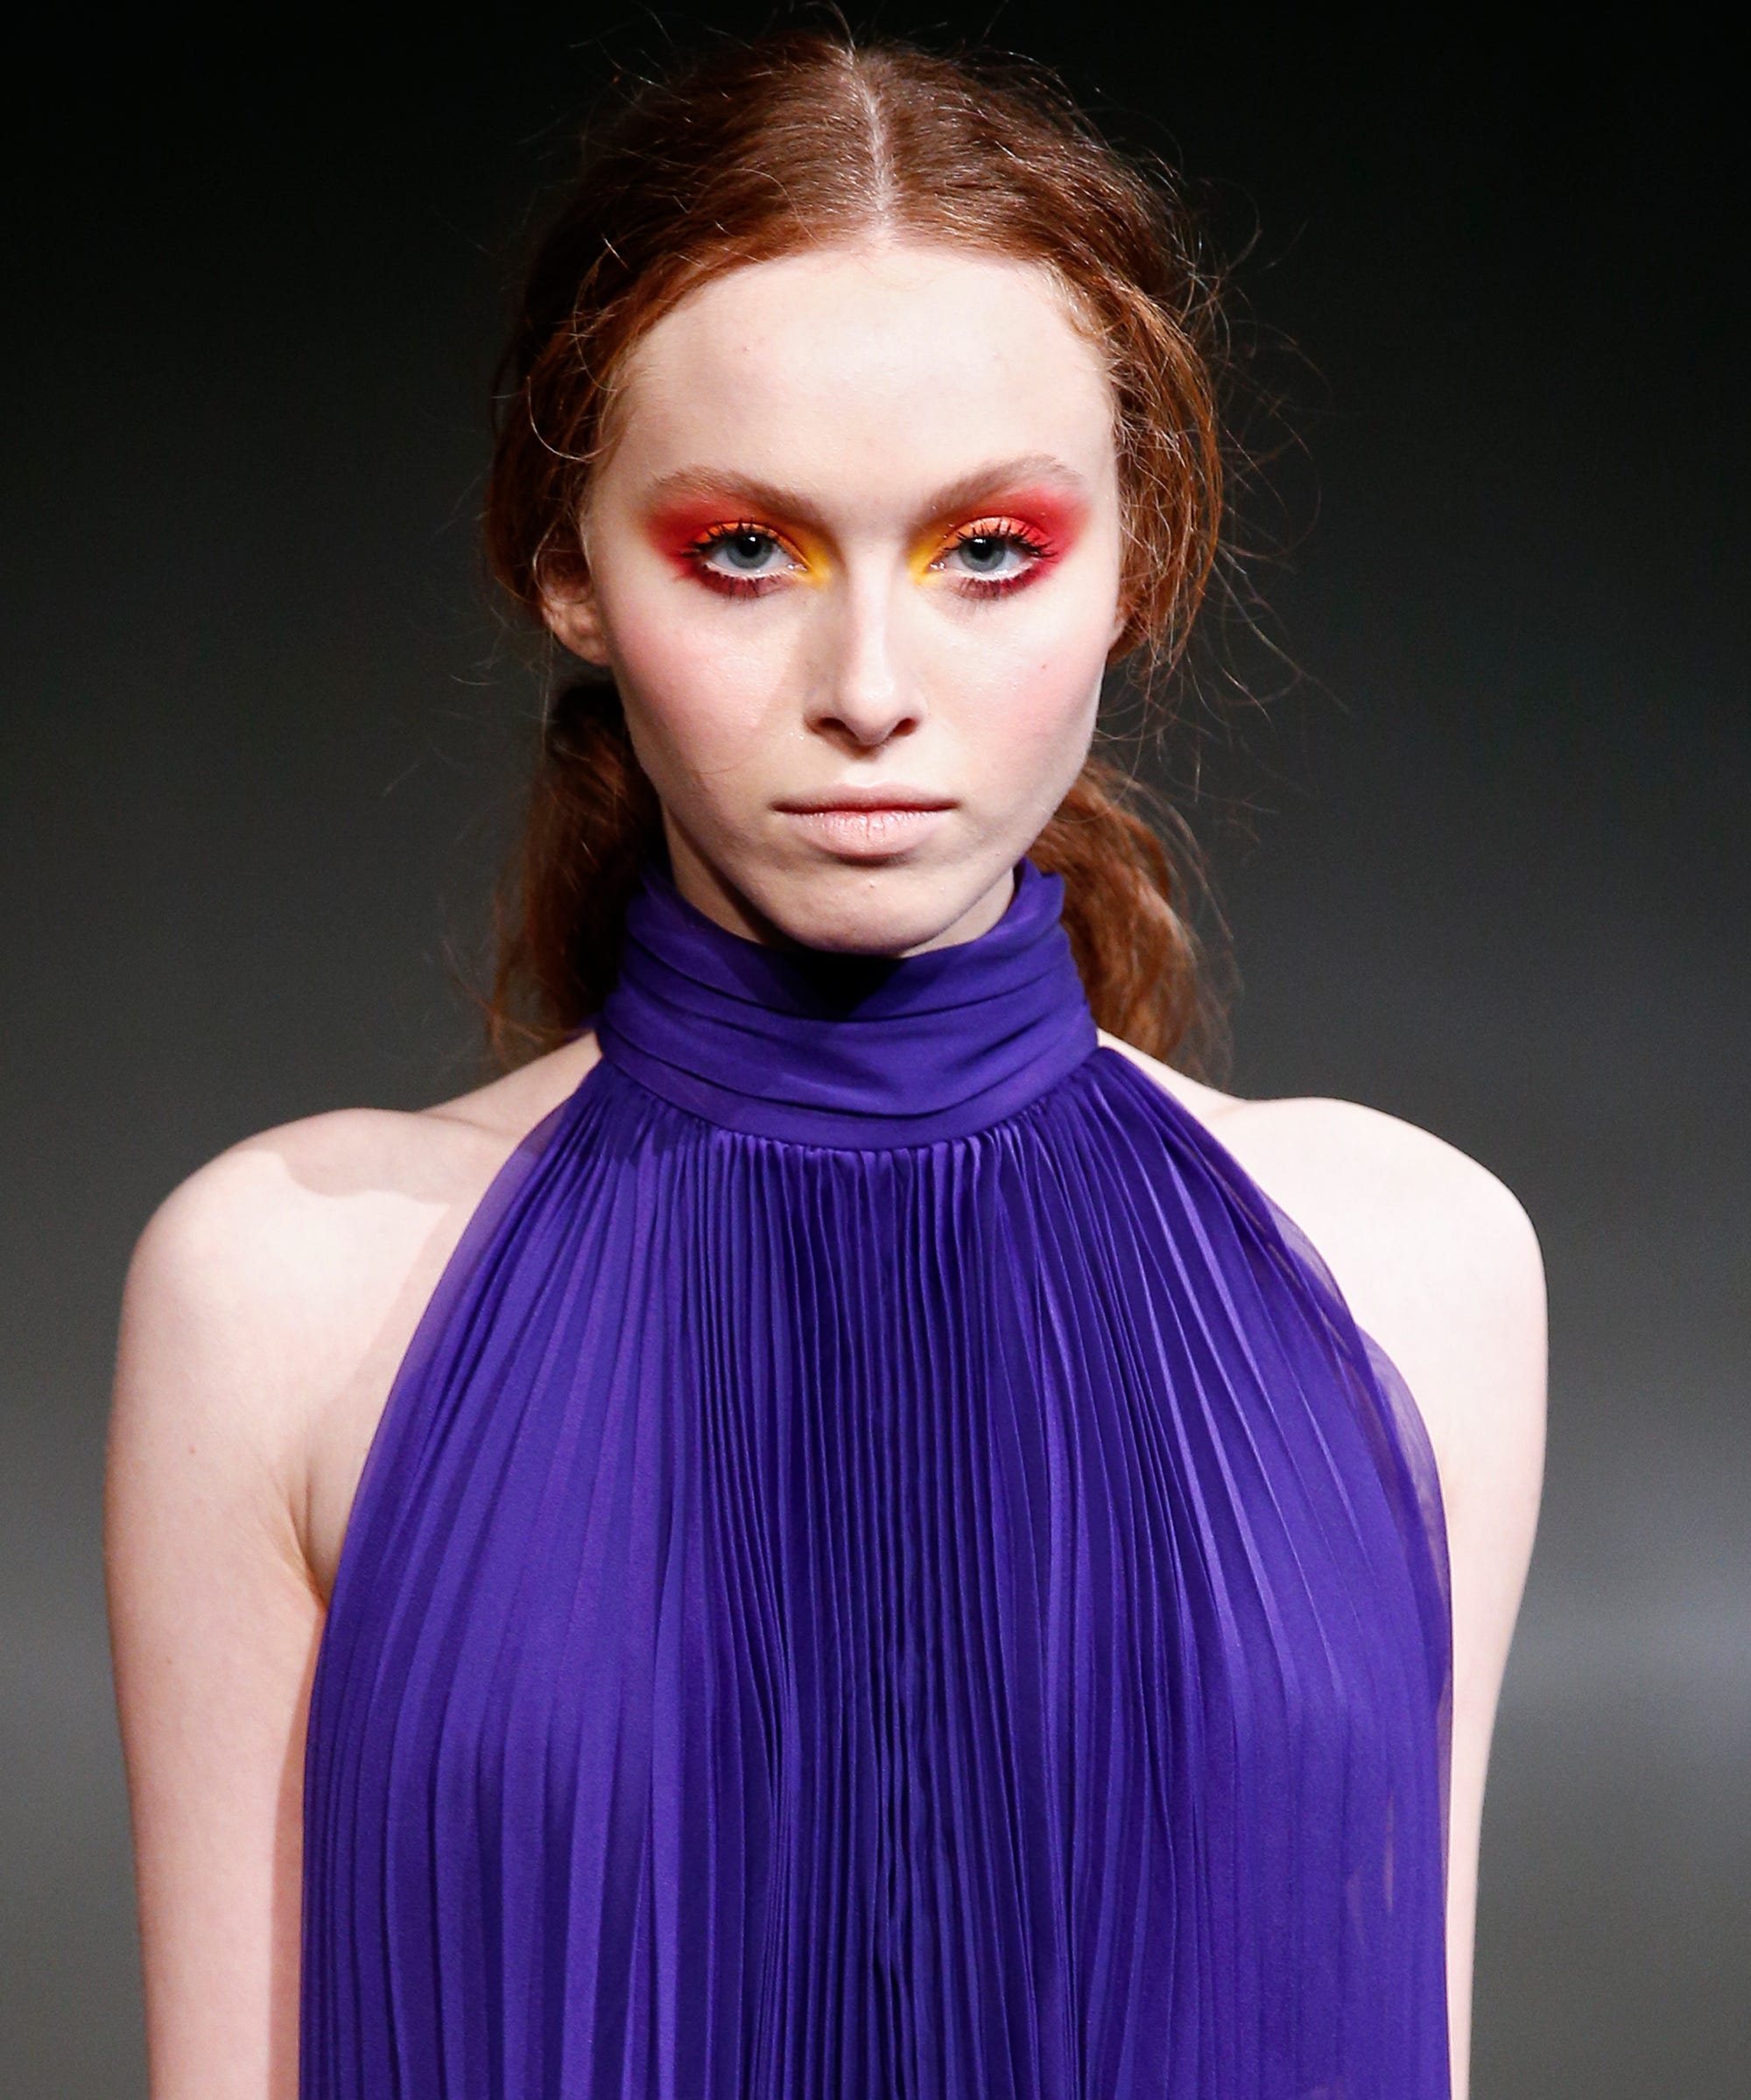 Beauty Trends Fashion Week Pink Makeup Smoky Eye Jill Lip Matte 13 Purplish Plum